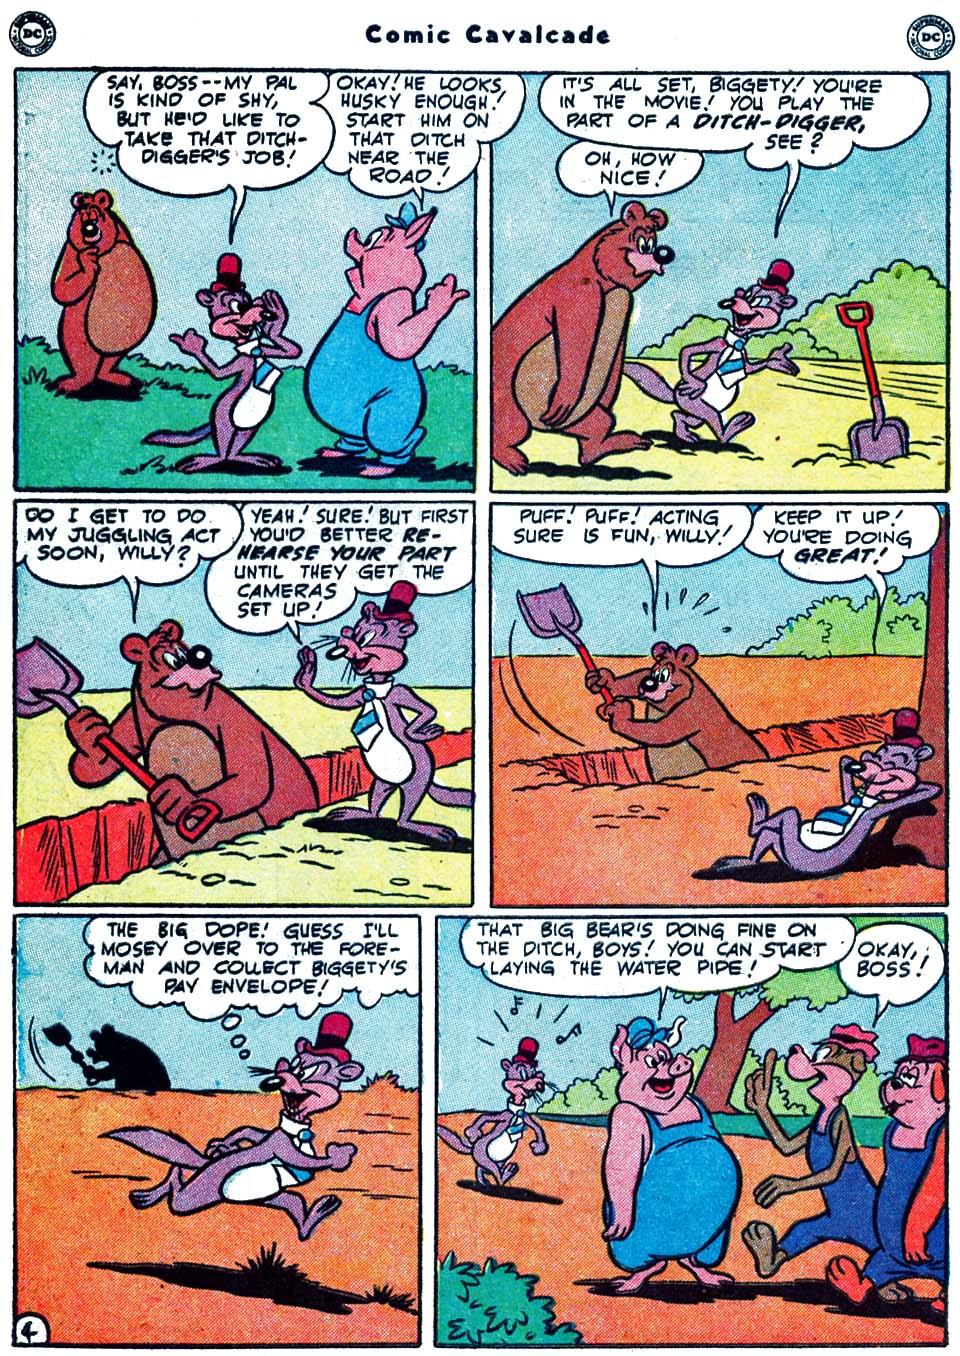 Comic Cavalcade issue 40 - Page 48